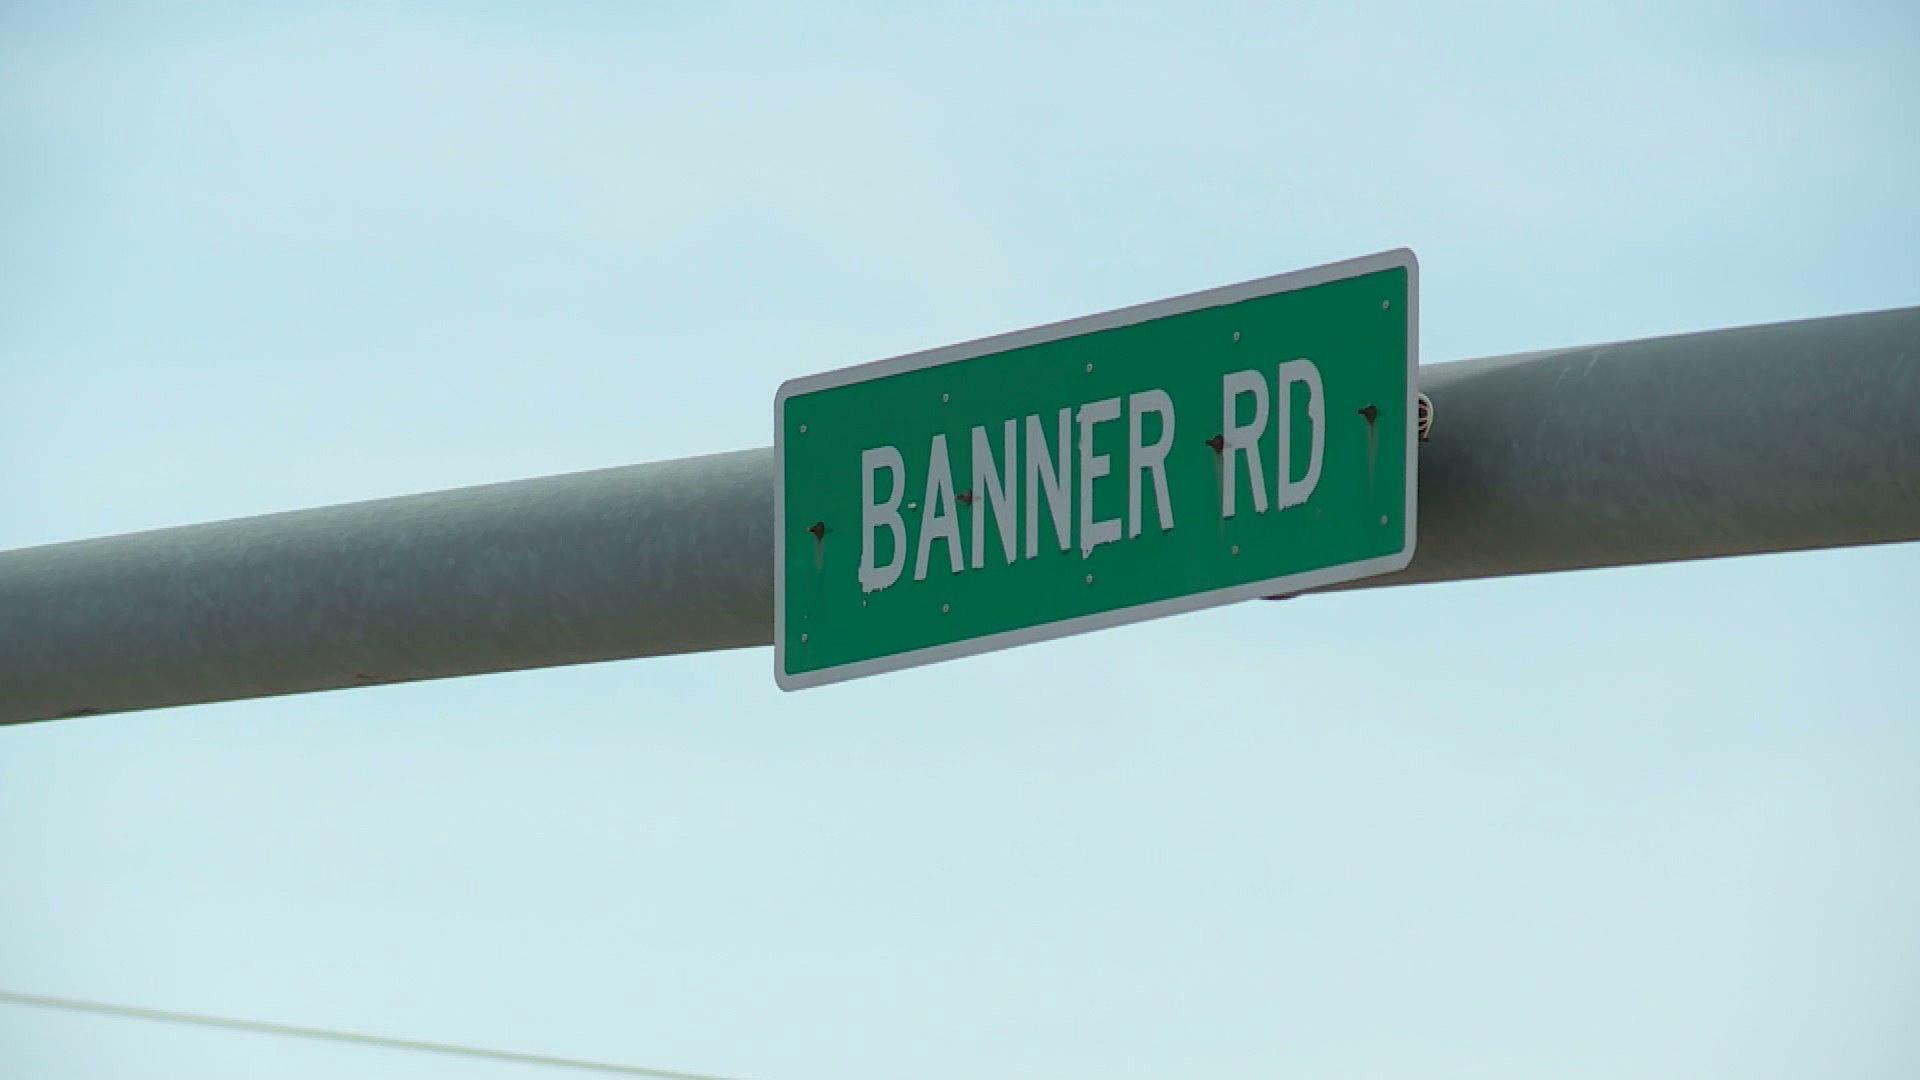 Banner Road street sign